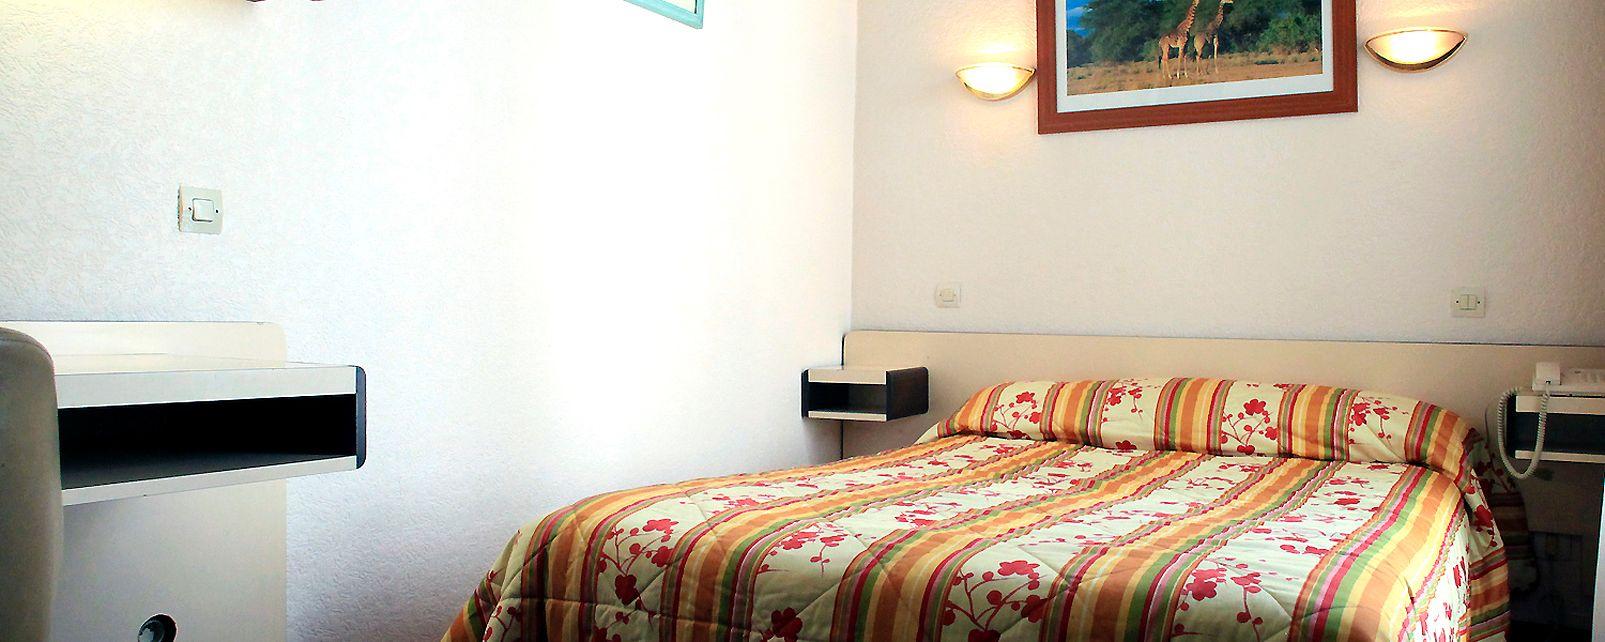 Hotel Batignolles Villiers